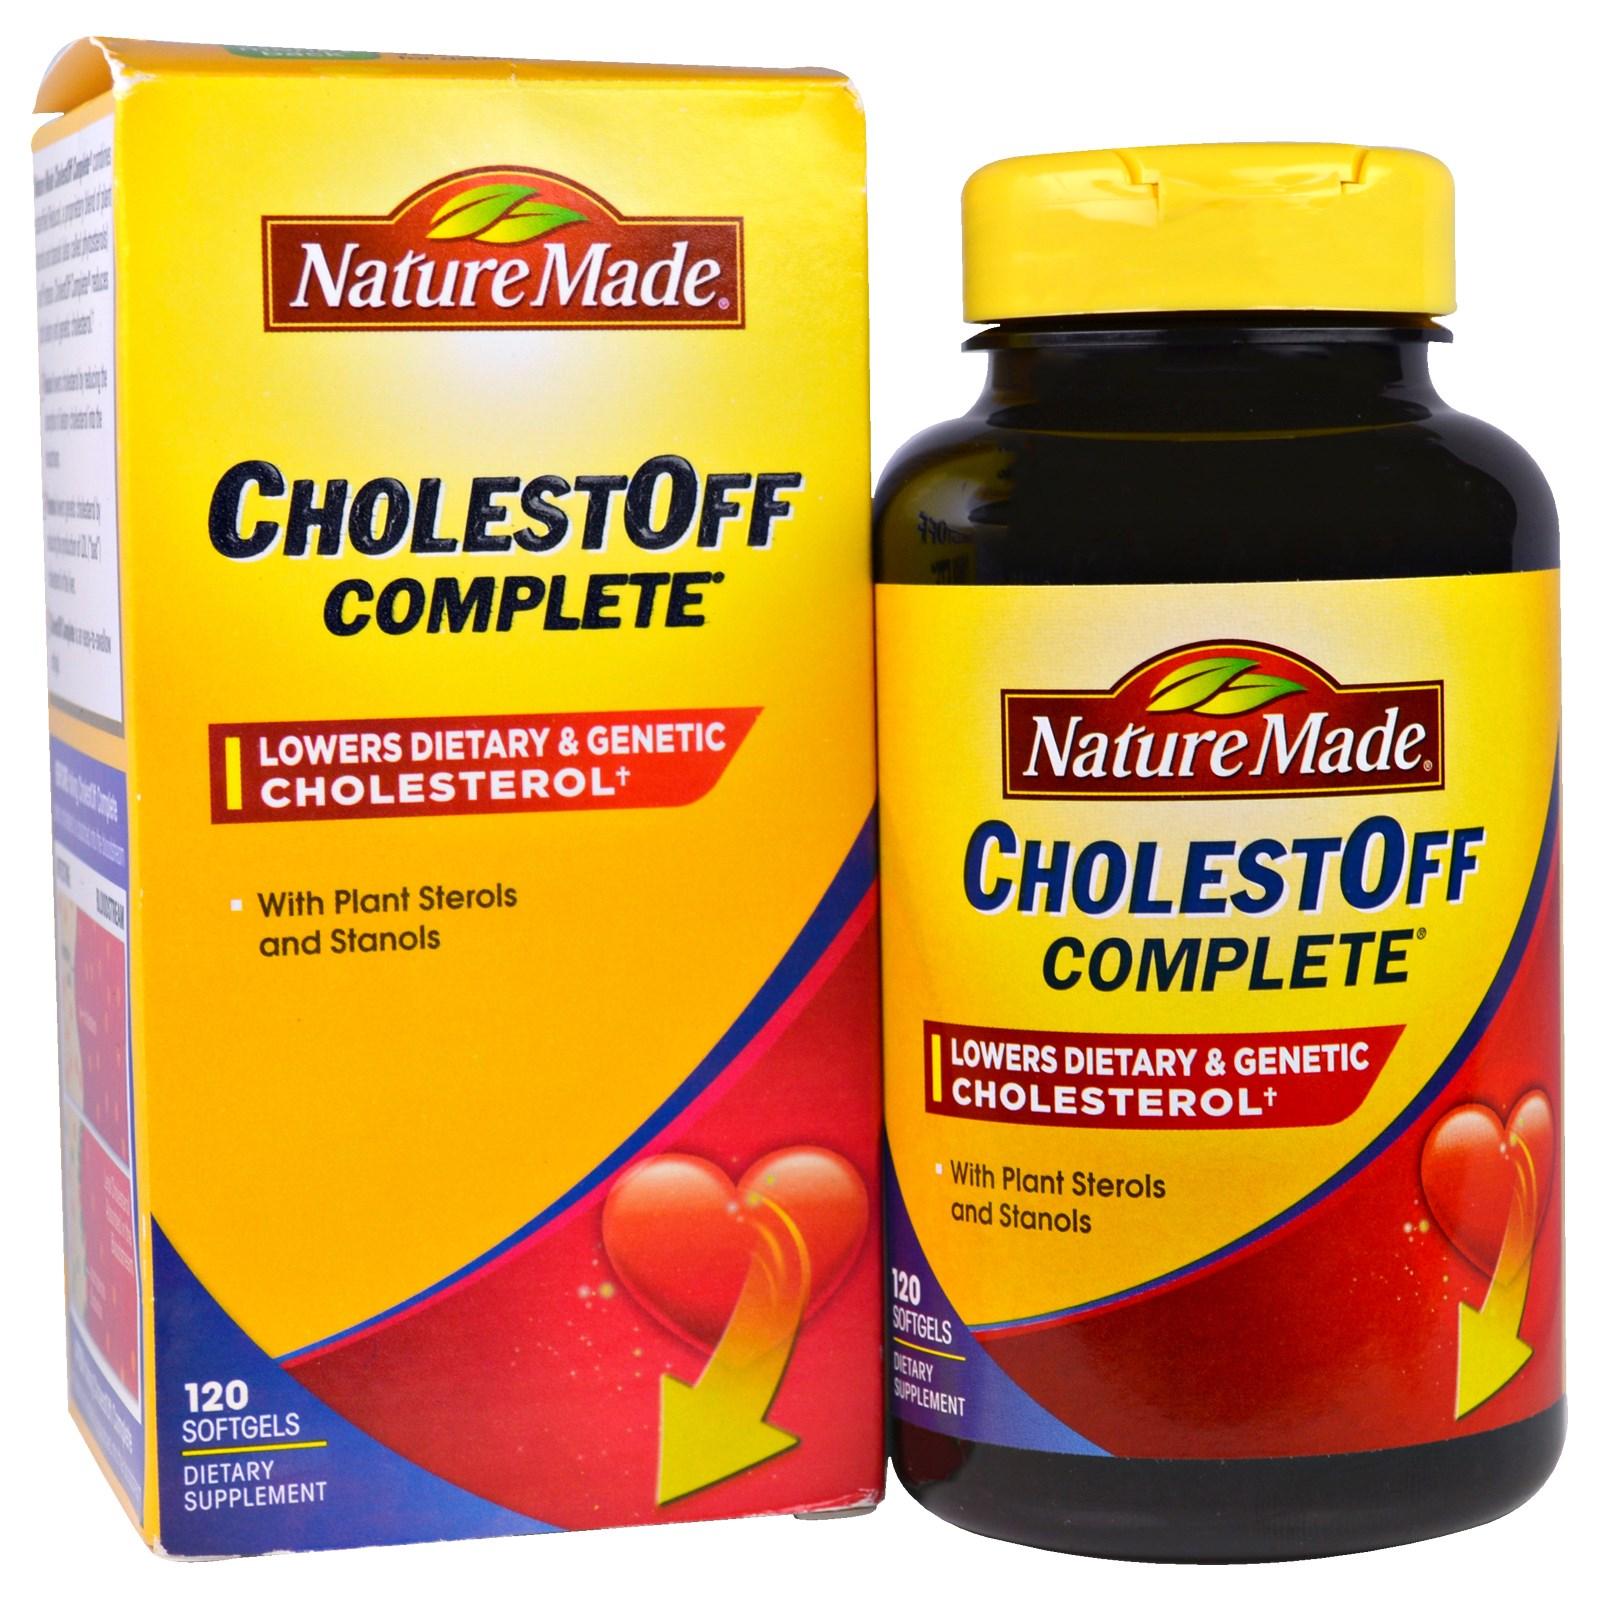 Nature Made Cholestoff Complete